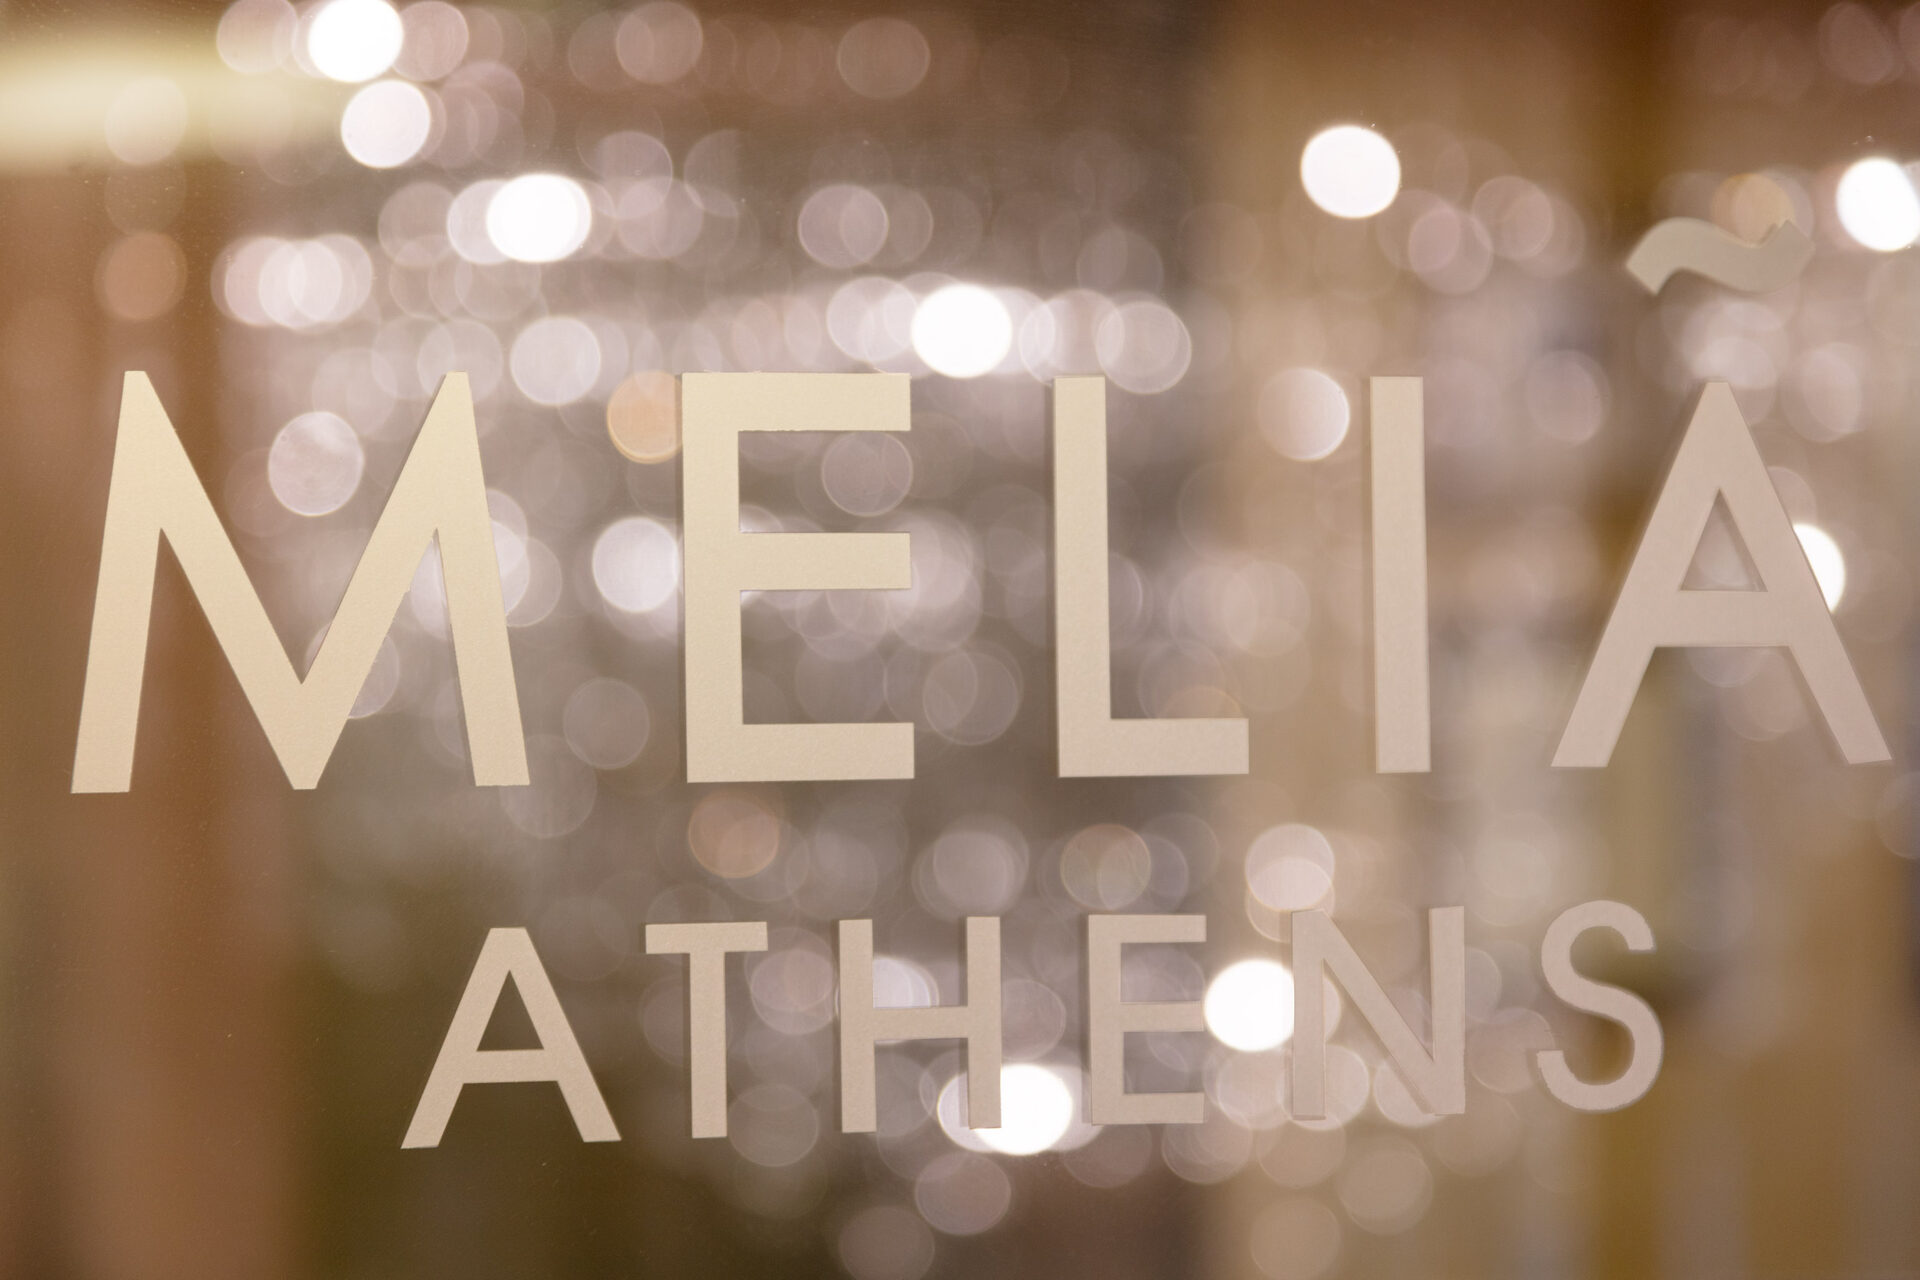 Melia Athens: General view